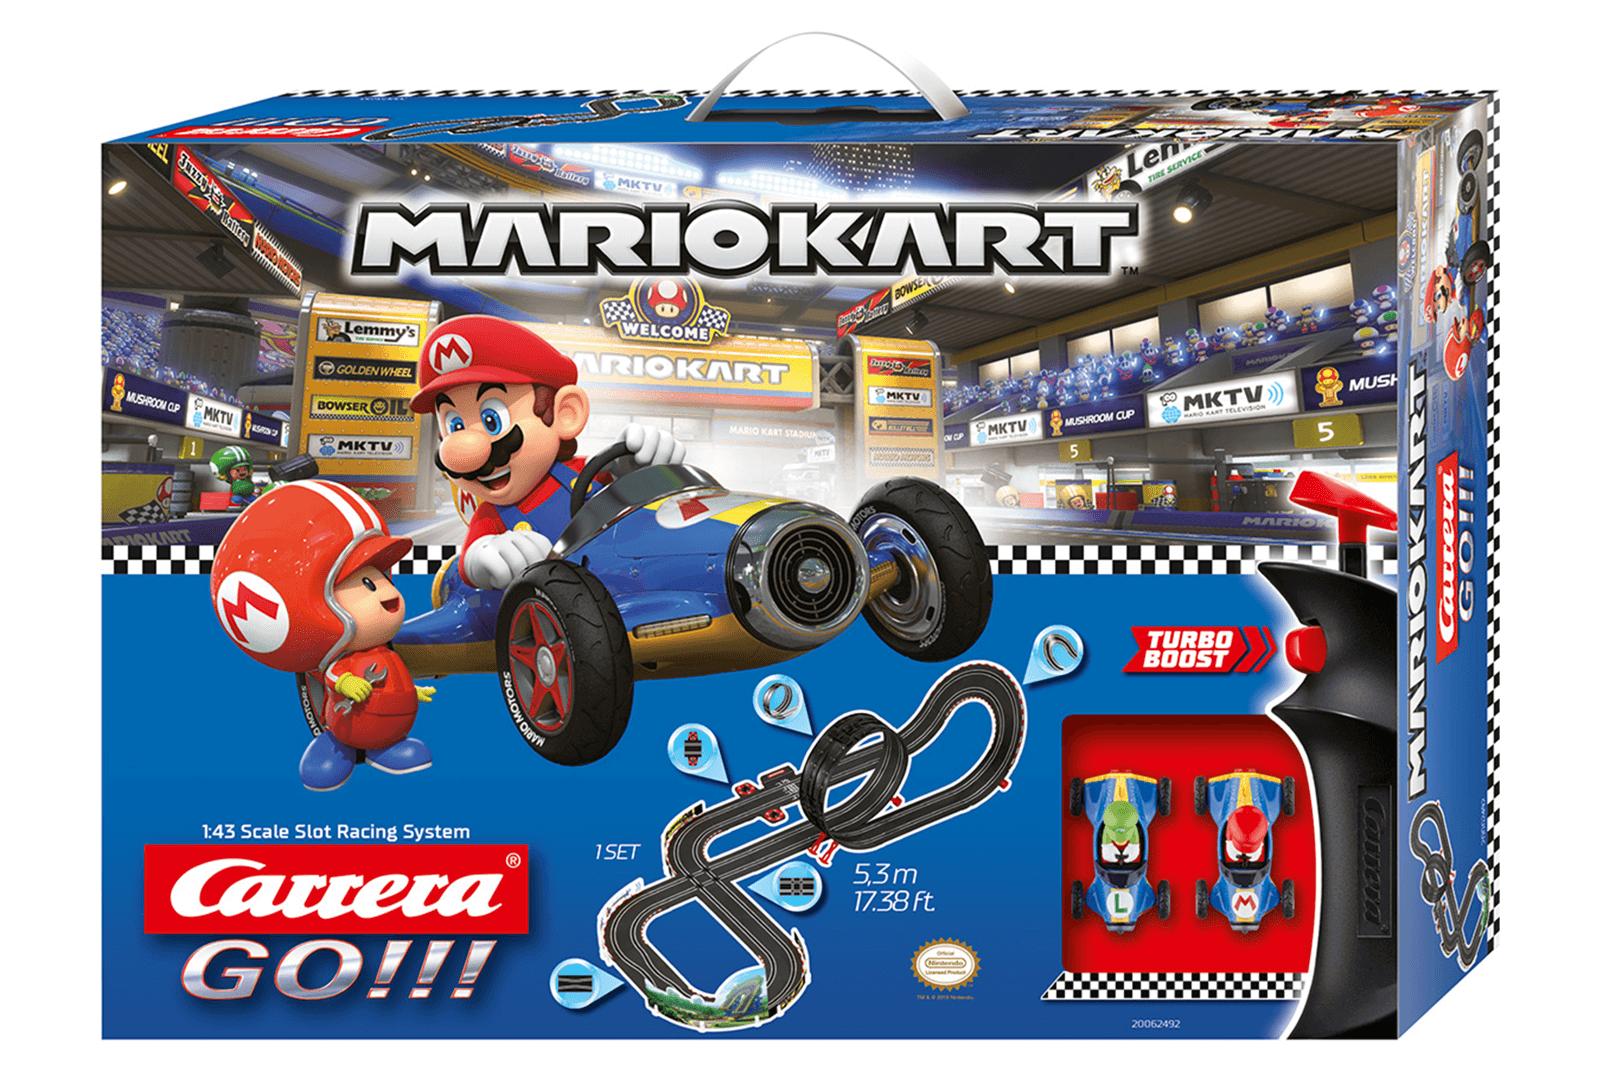 Nintendo Mario Kart™ - Mach 8 - 20062492